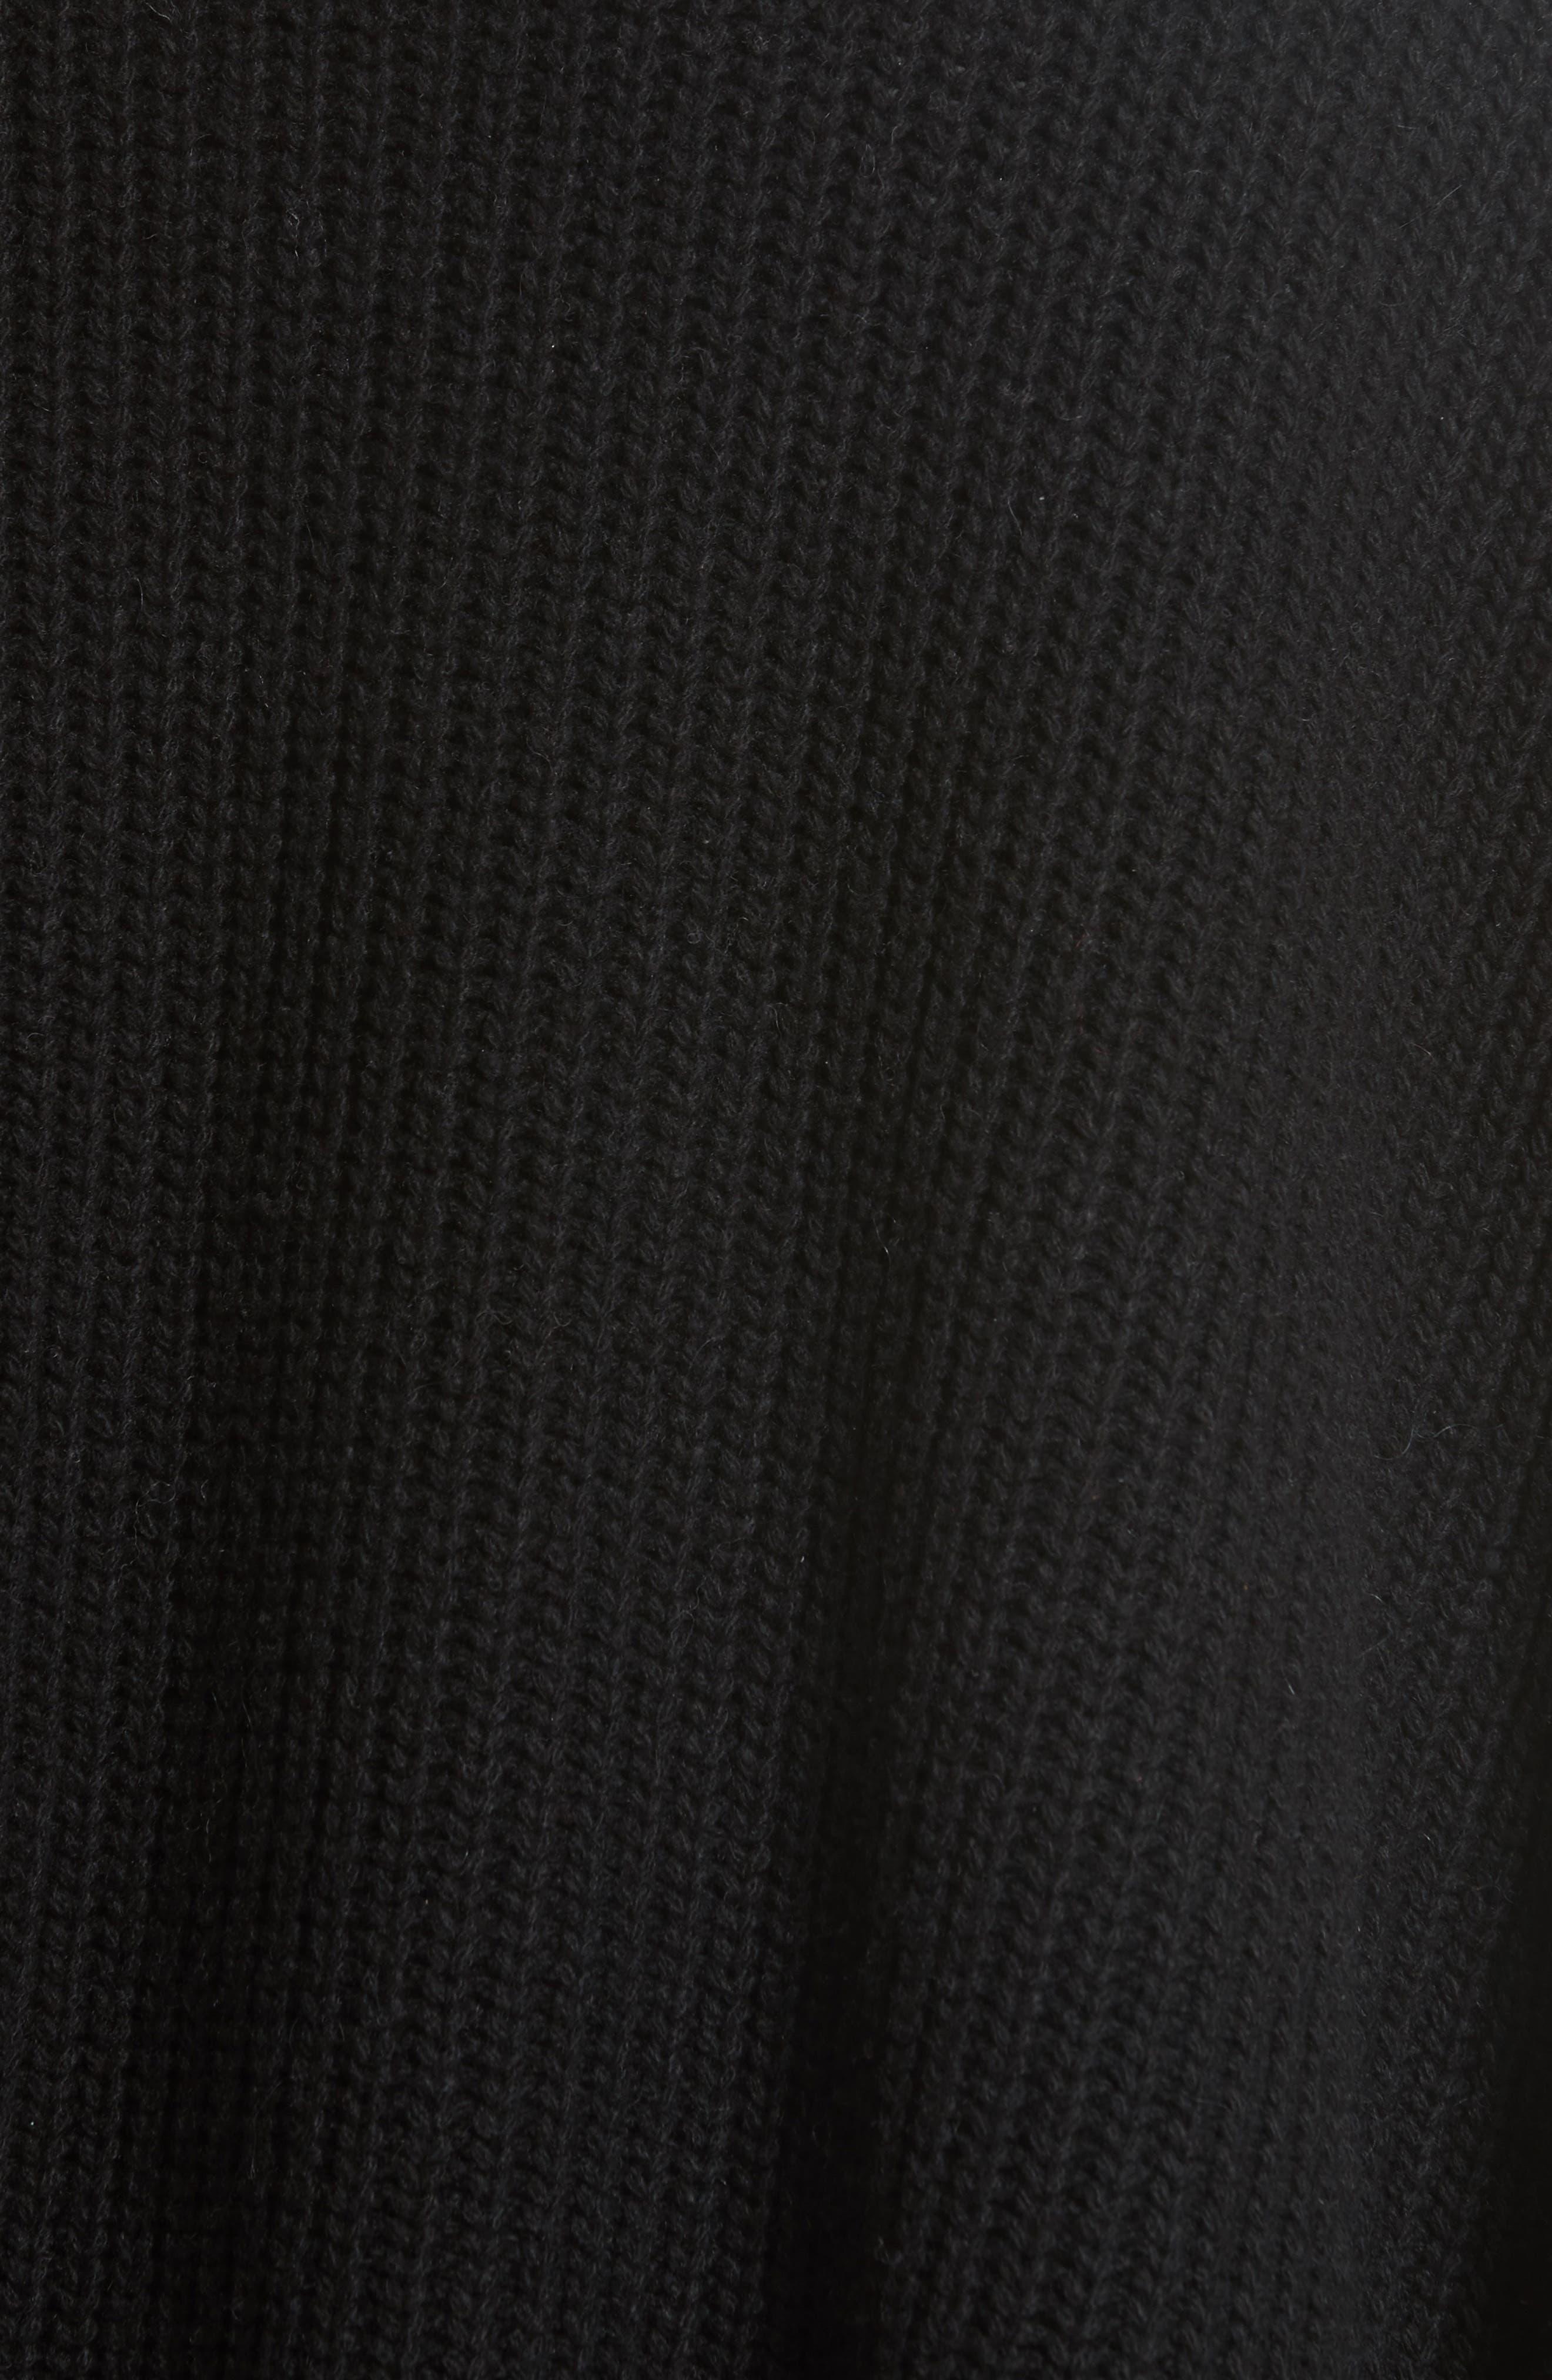 Serina Oversize Sweater,                             Alternate thumbnail 5, color,                             007